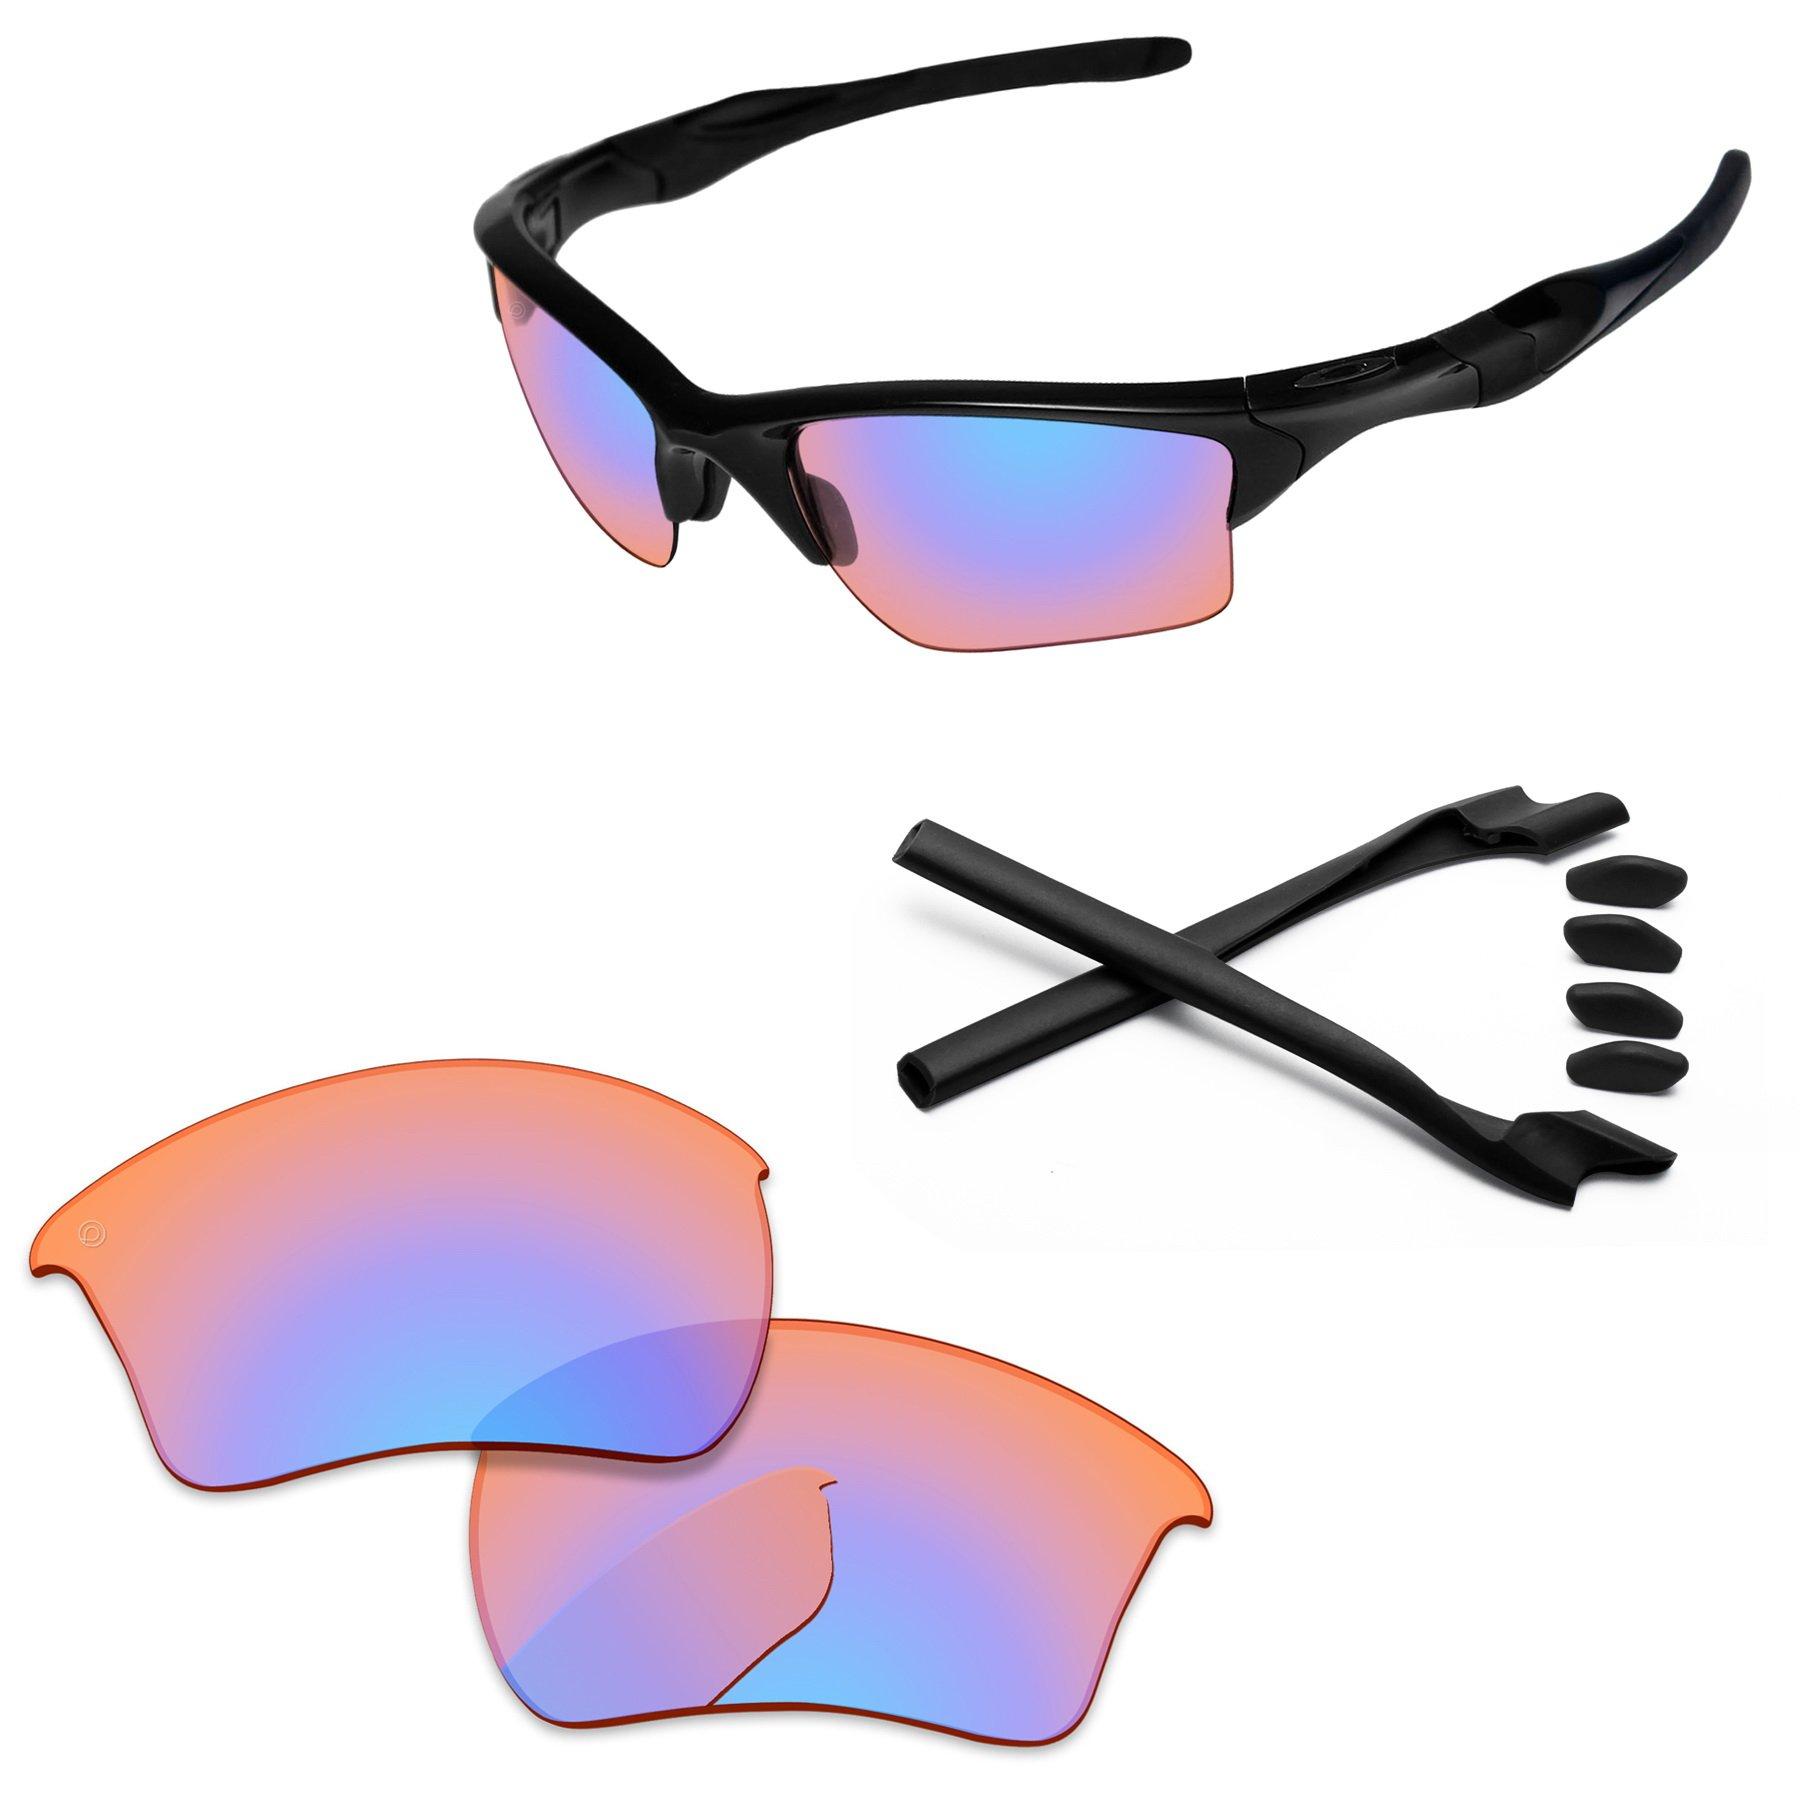 4b23929550bce PapaViva Replacement Lenses   Rubber Kits for Oakley Half Jacket 2.0 XL  Pro+ Orange Trail